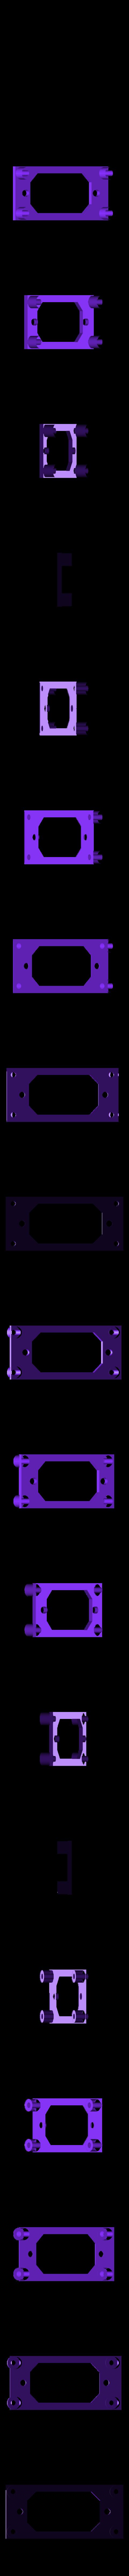 bhl-feather-mount.stl Download free STL file NeoPixel Bike Light • 3D printer template, Adafruit